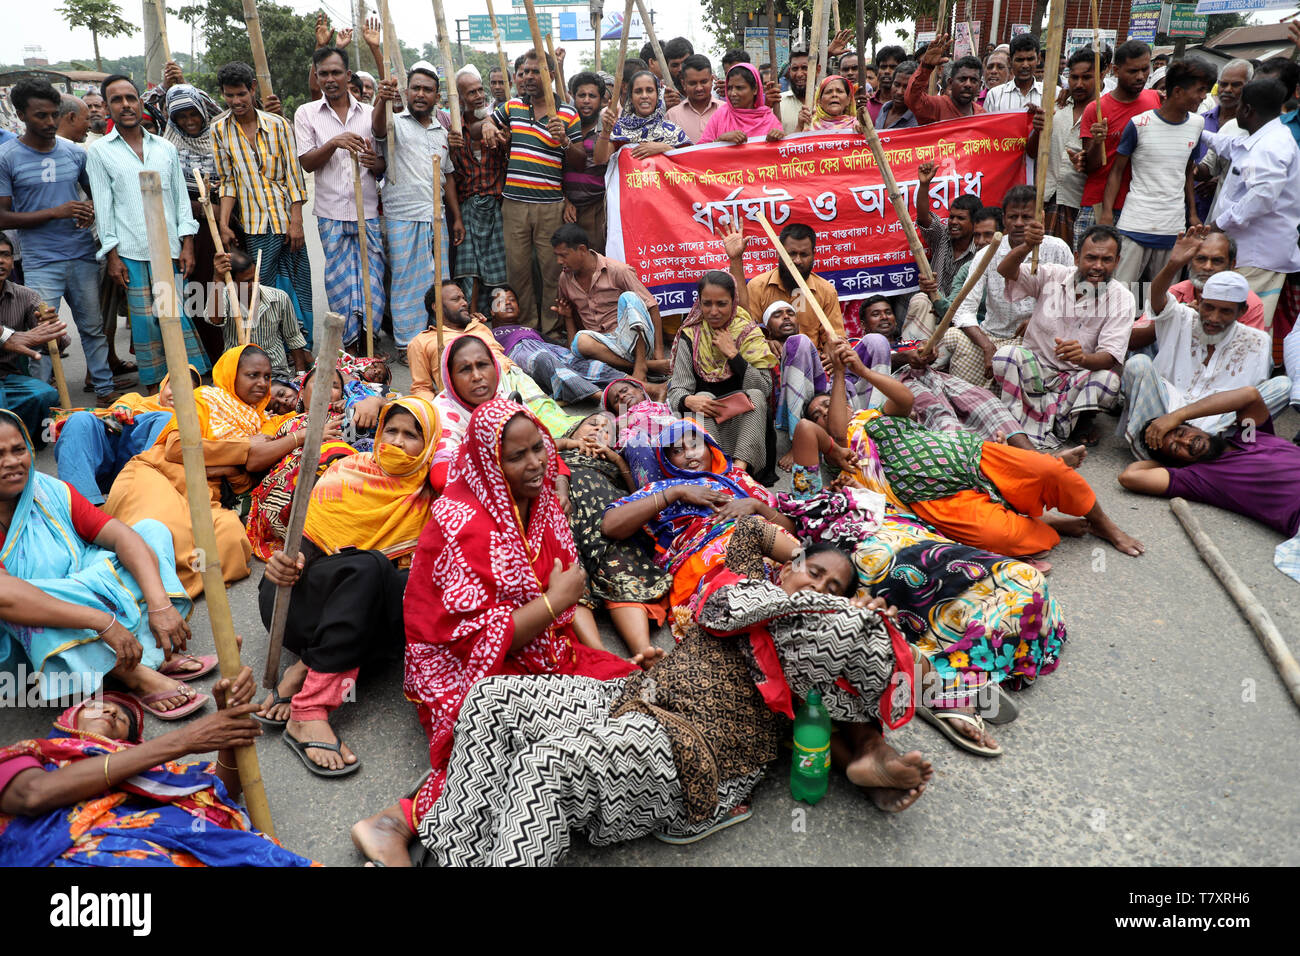 Dhaka, Bangladesh - May 08, 2019: Jute mill workers staged demonstrations stretching from Demra to Jatrabari in Dhaka, Bangladesh on May 08, 2019 to p Stock Photo